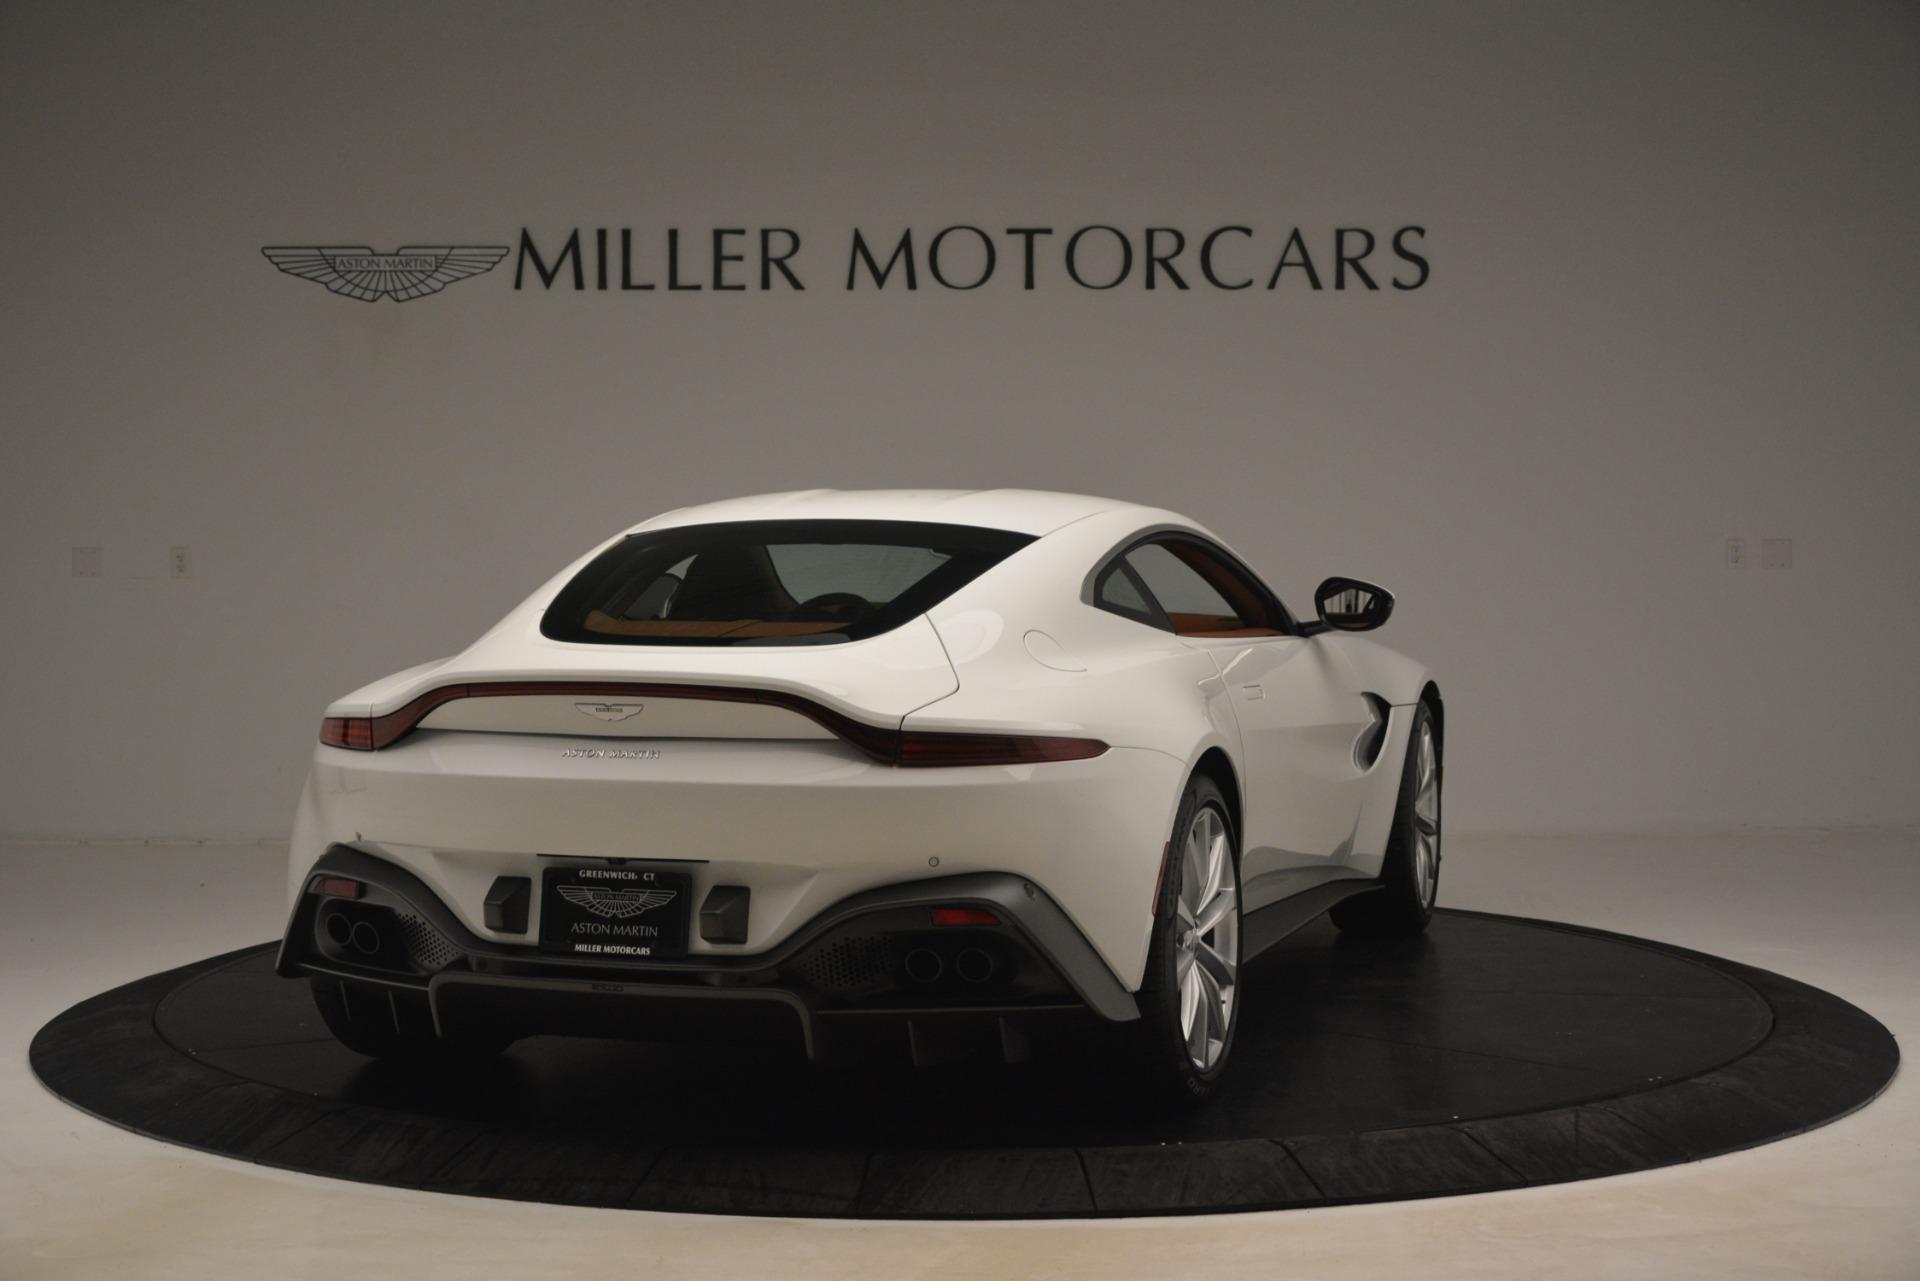 New 2019 Aston Martin Vantage Coupe For Sale In Greenwich, CT. Alfa Romeo of Greenwich, A1373 3227_p6